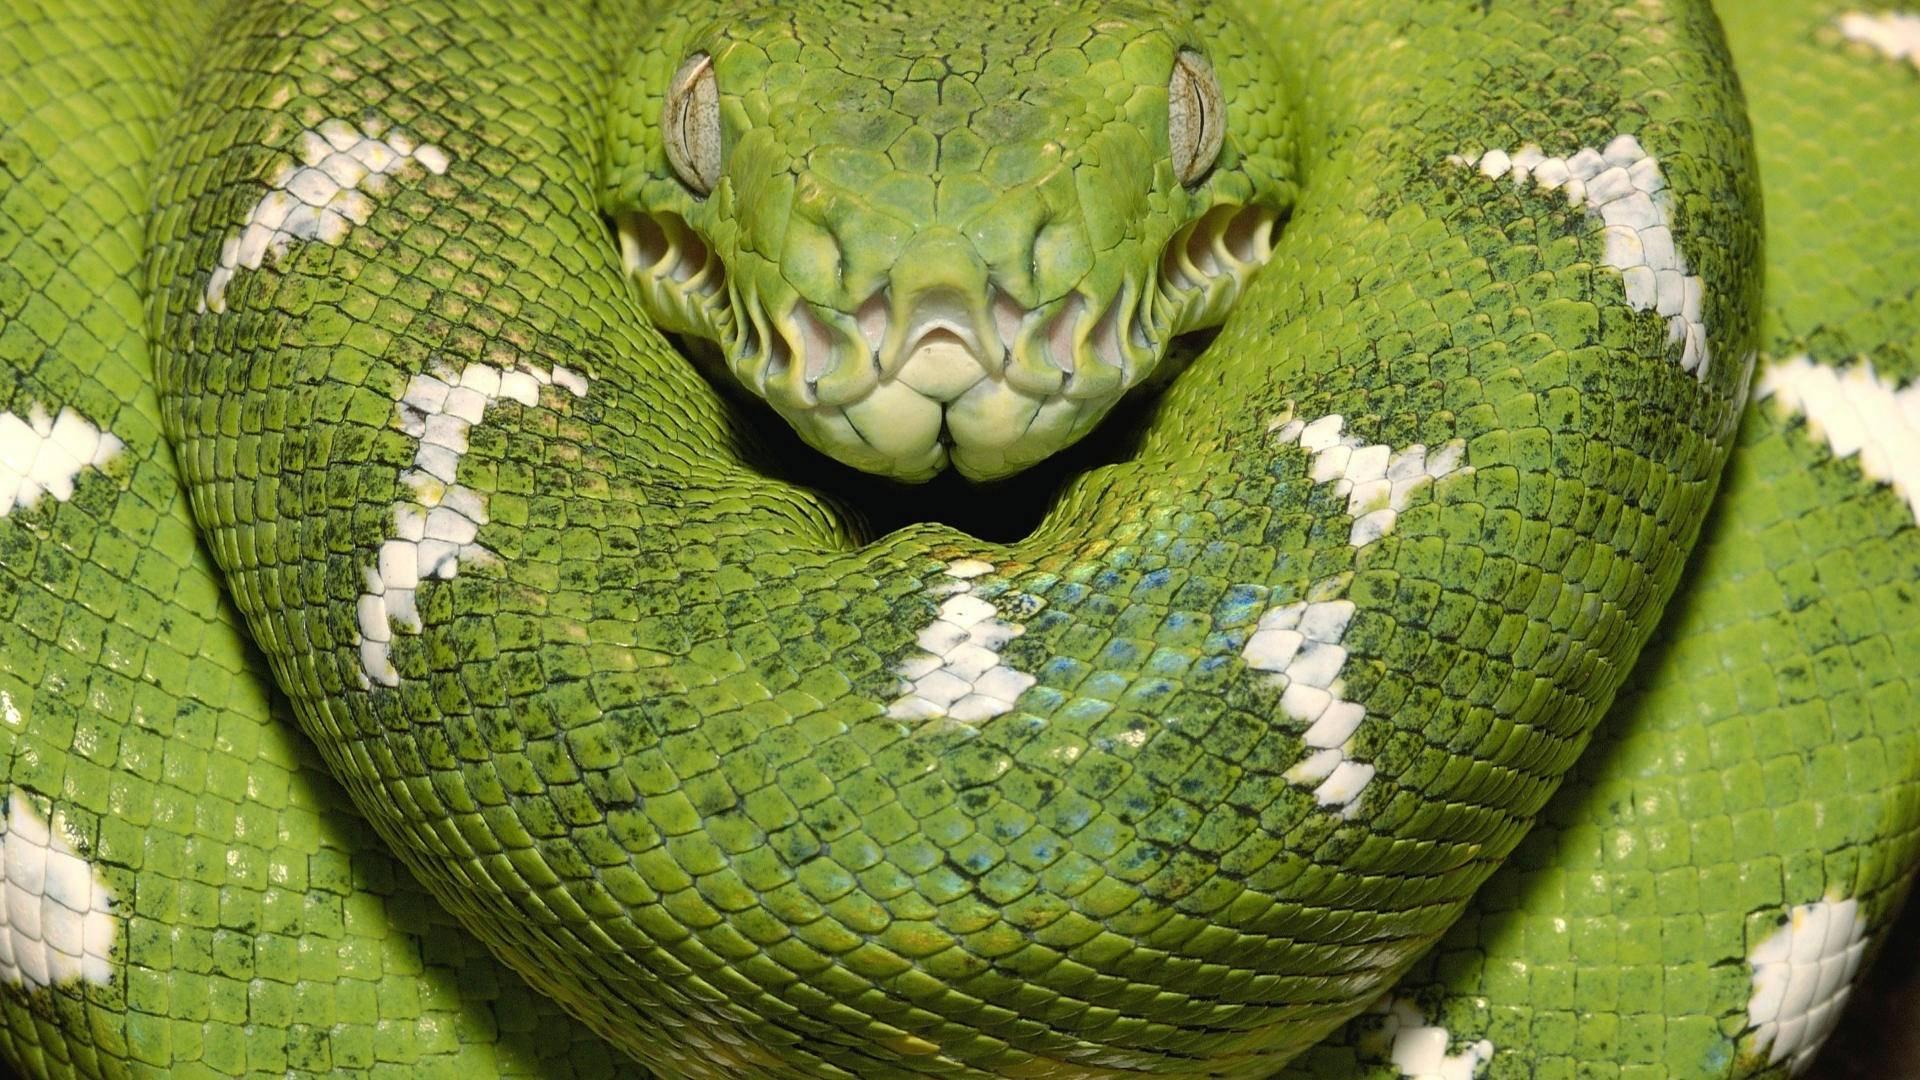 Snake hd wallpapers - Green snake hd wallpaper ...